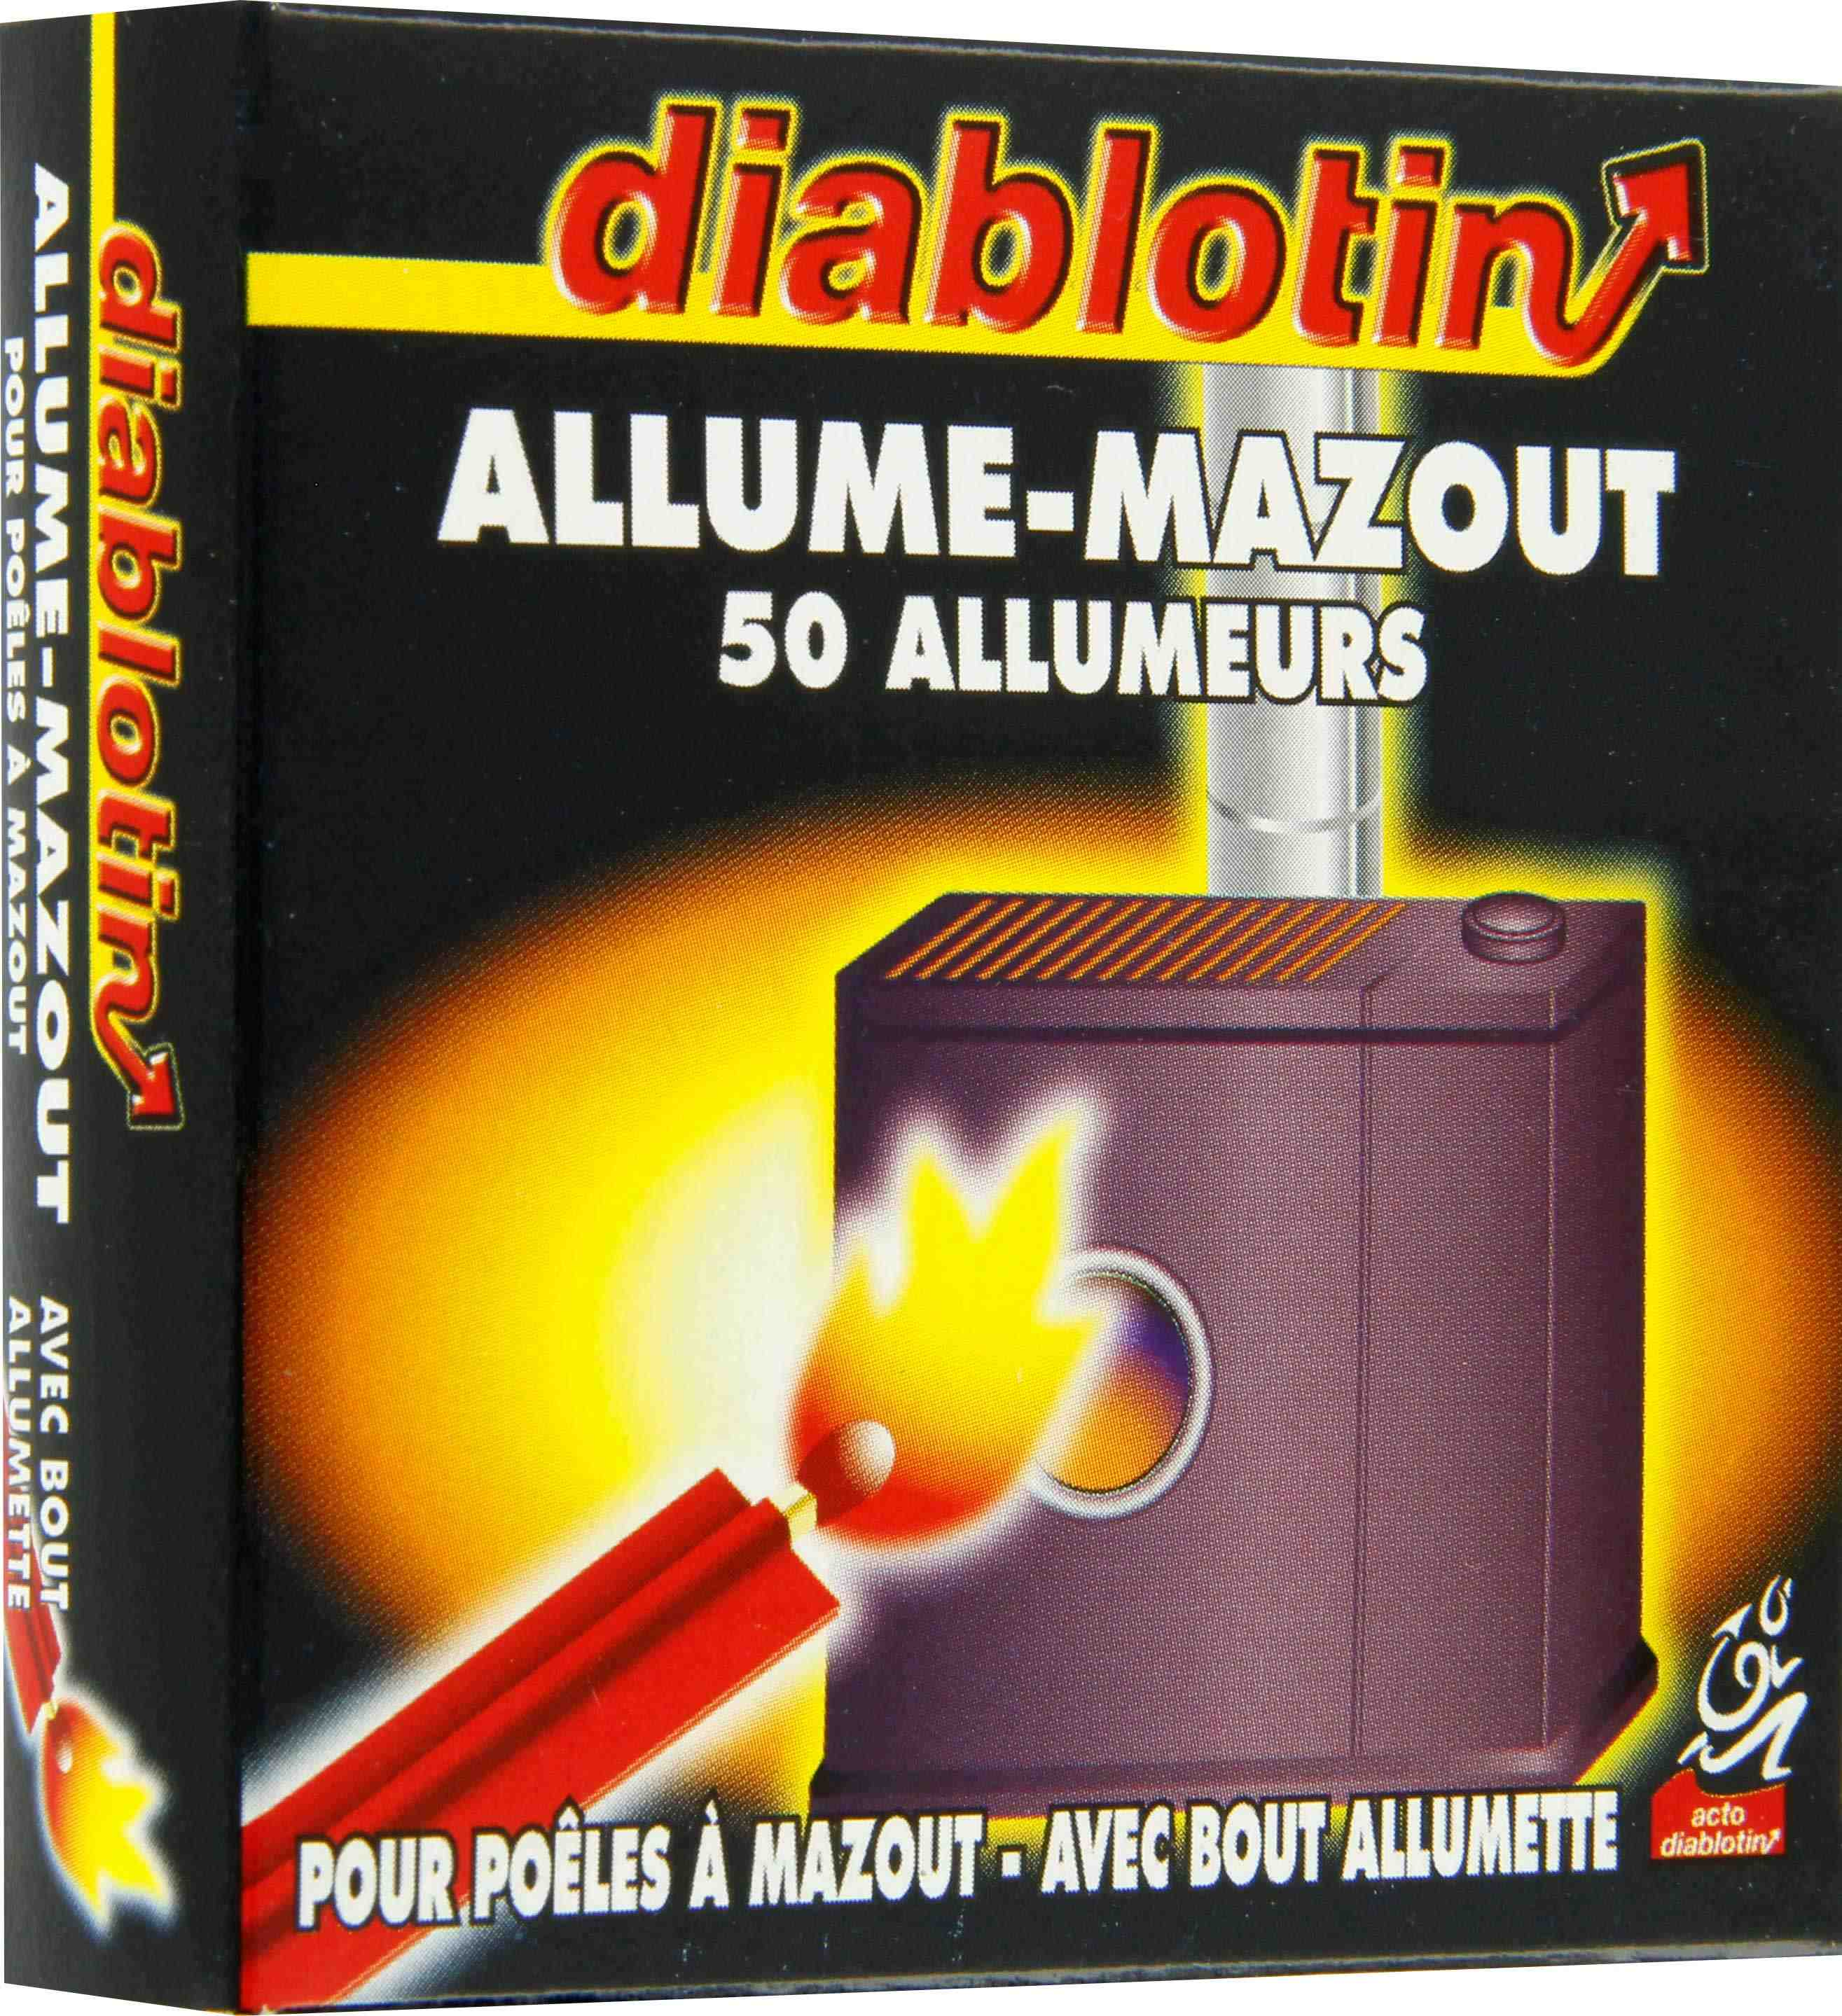 allume mazout avec bout allumette diablotin vendu par 50 de allume mazout. Black Bedroom Furniture Sets. Home Design Ideas